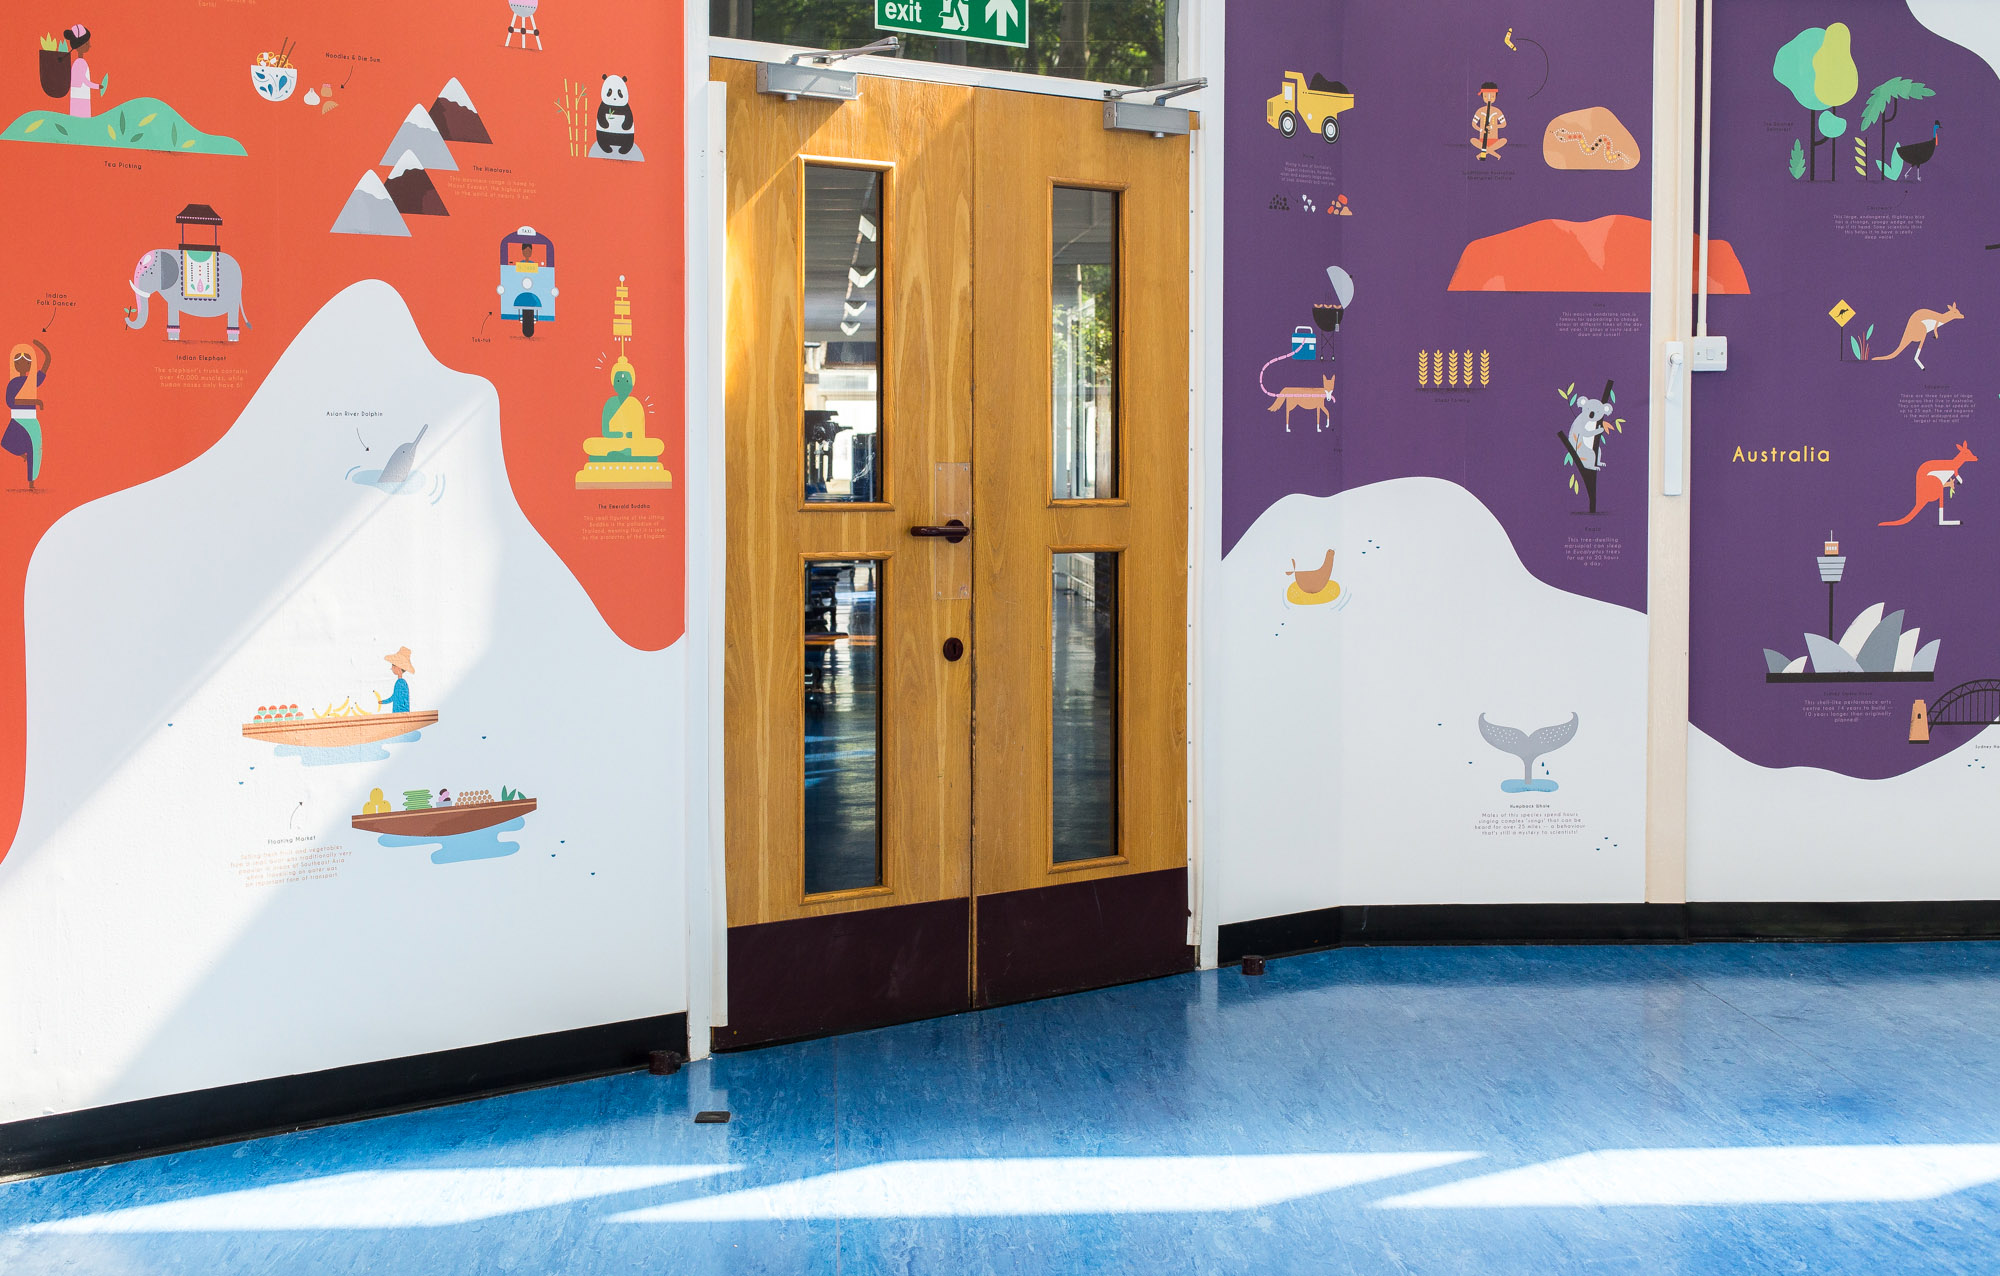 hannahalice-illustration-spacedesign-world-map-grazebrookprimaryschool-mural-wallpaper.jpg